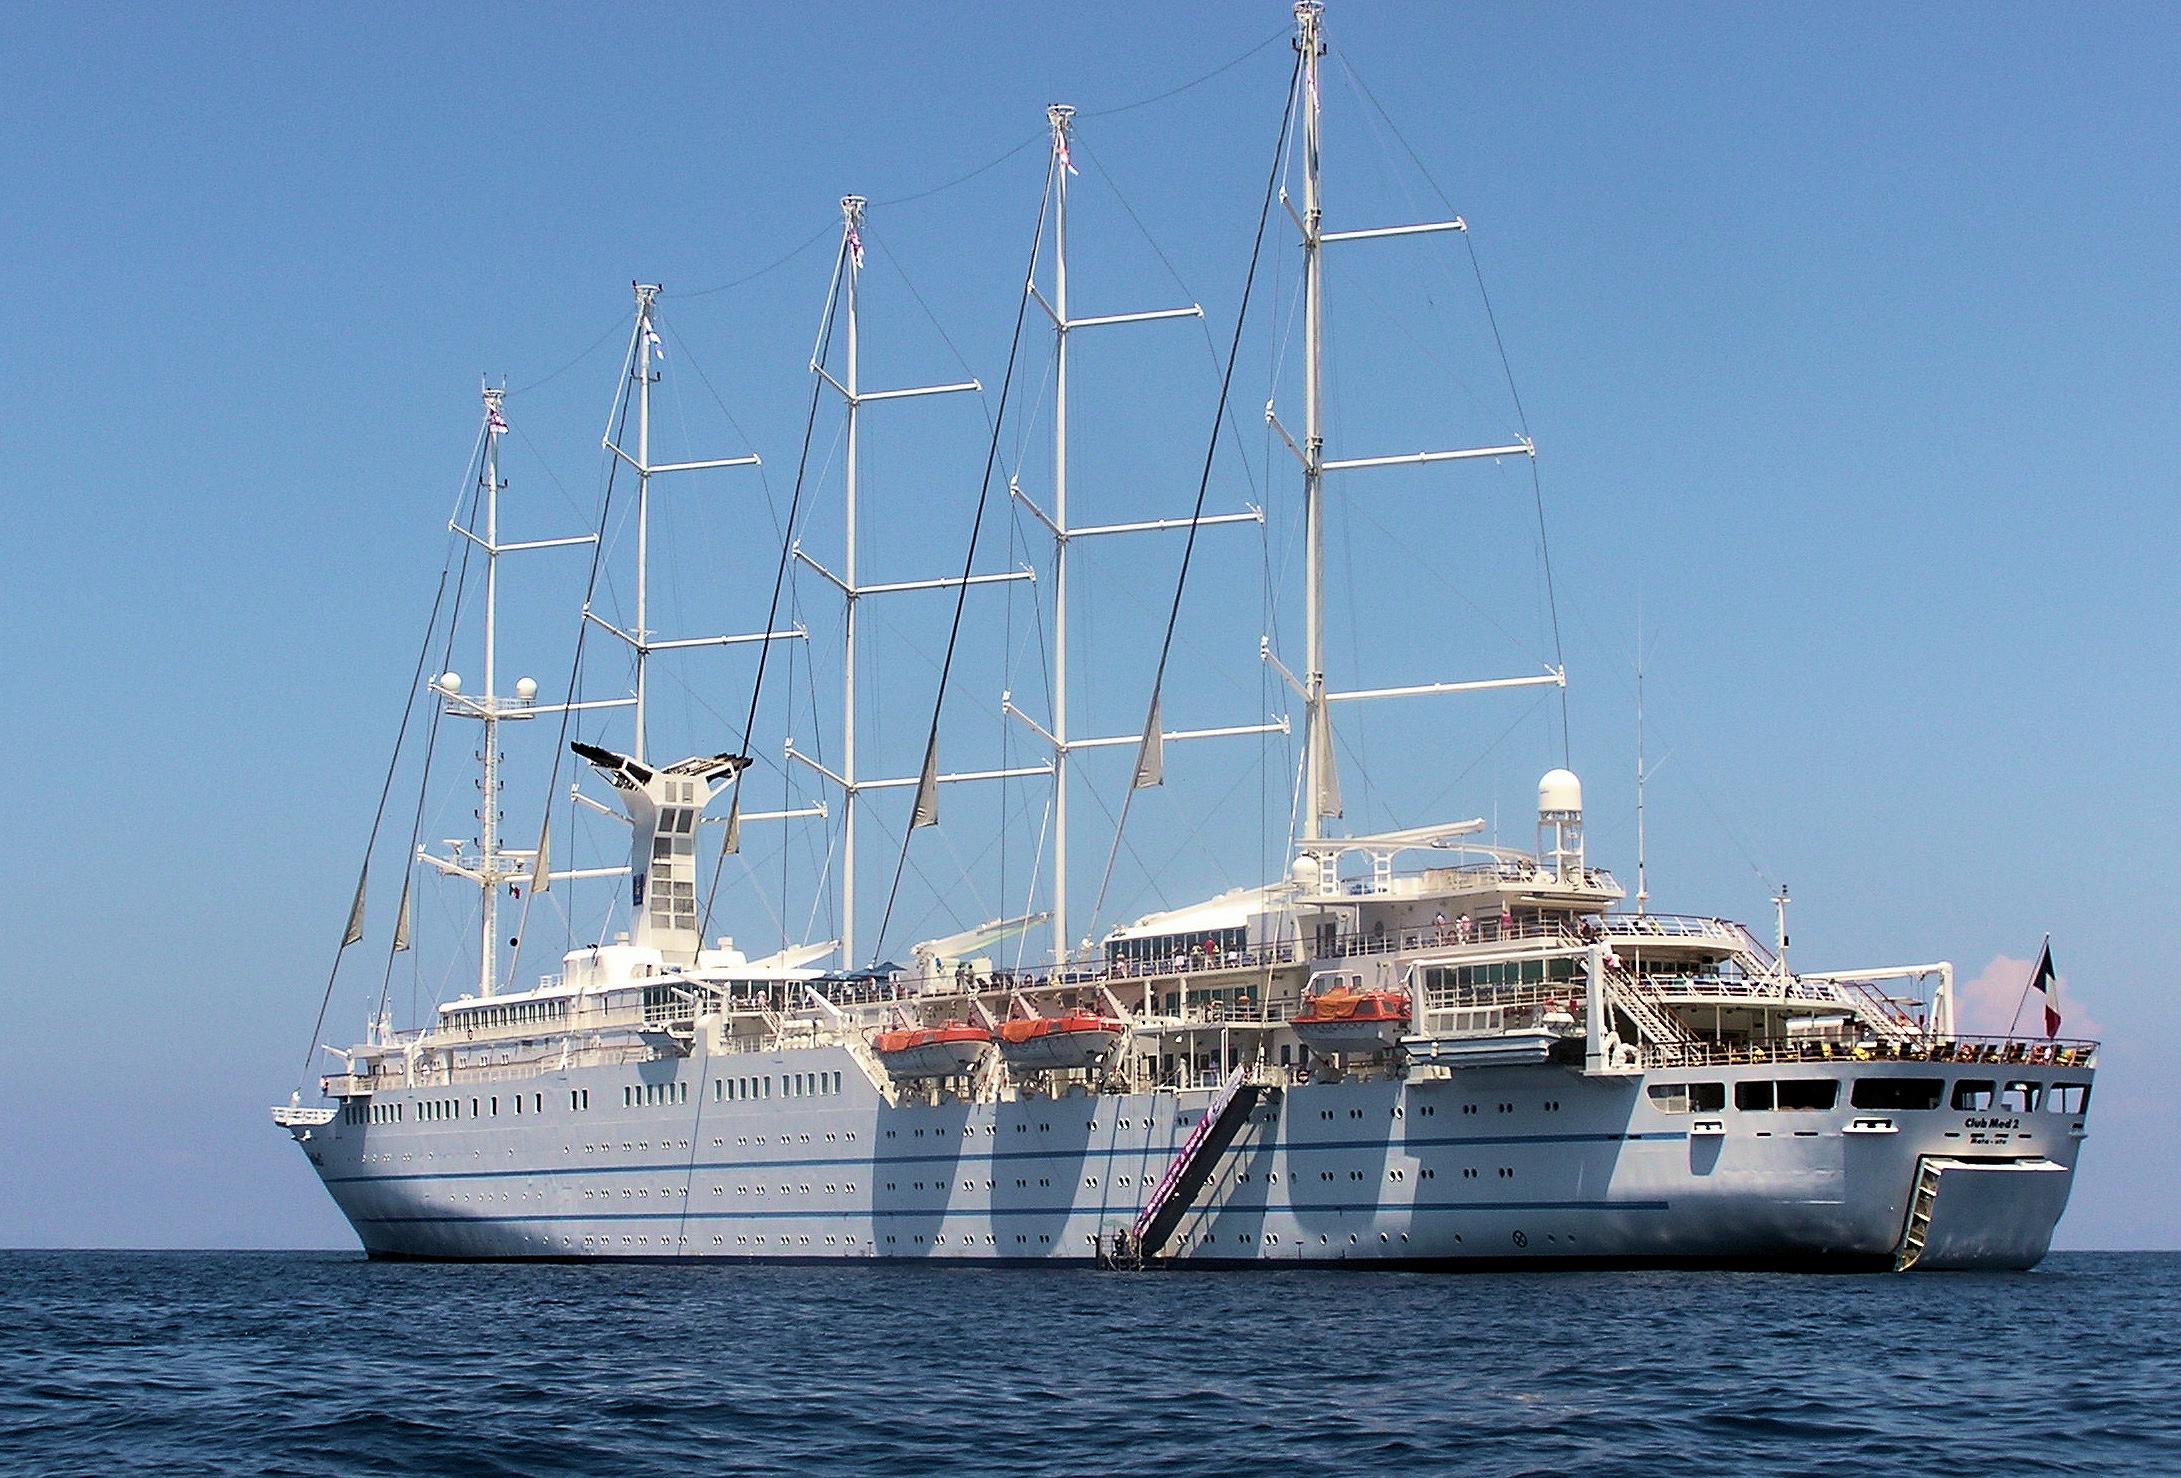 Club Med 2 Wikipedia